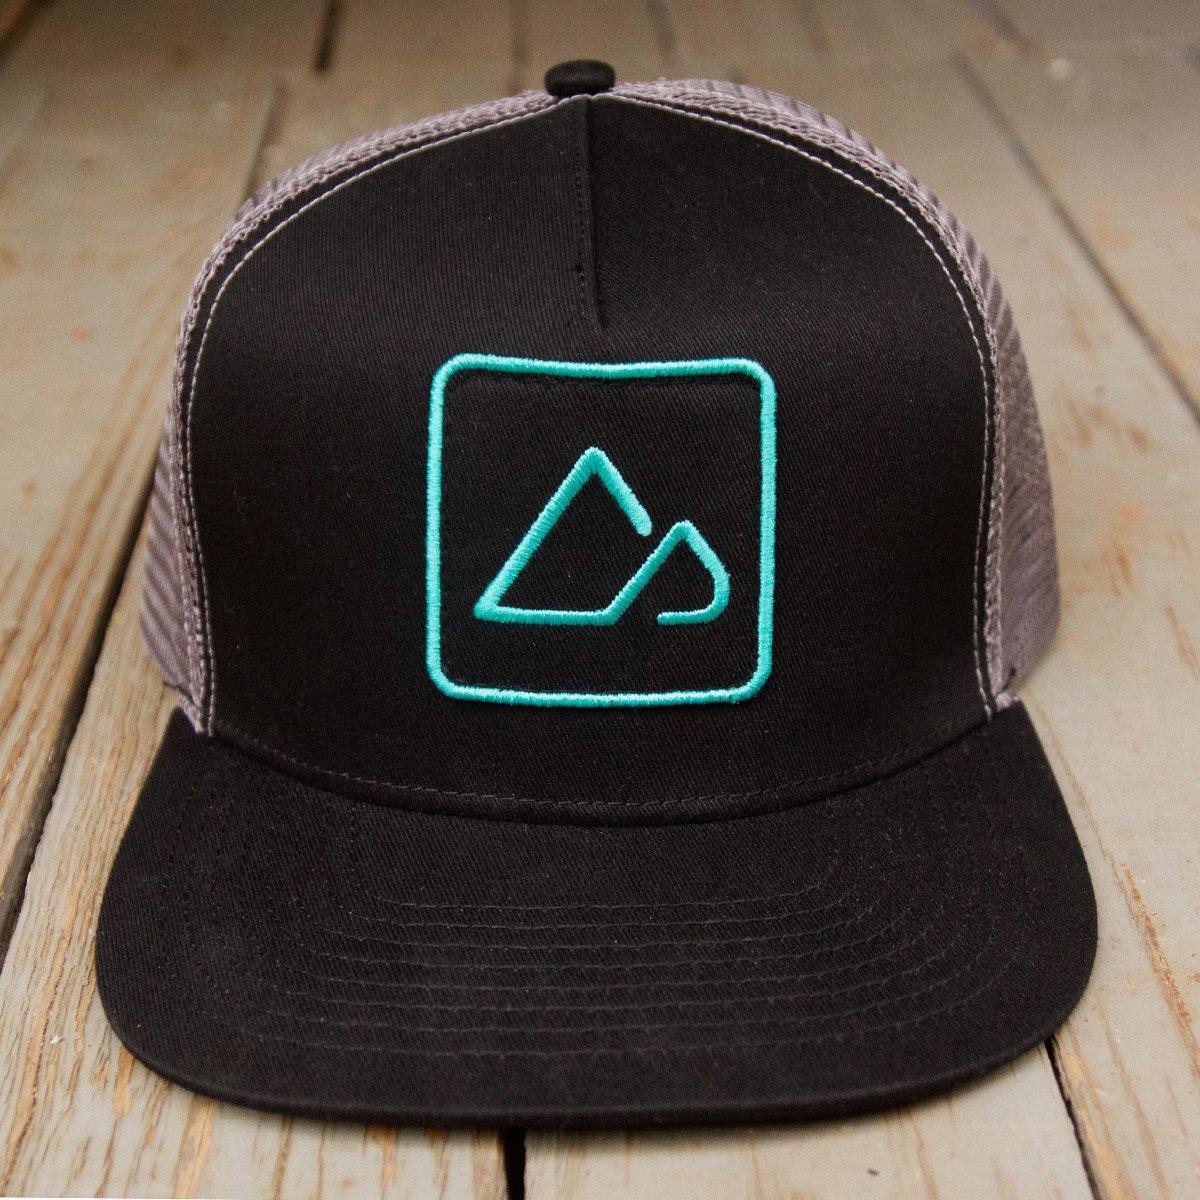 hats1_2048x2048